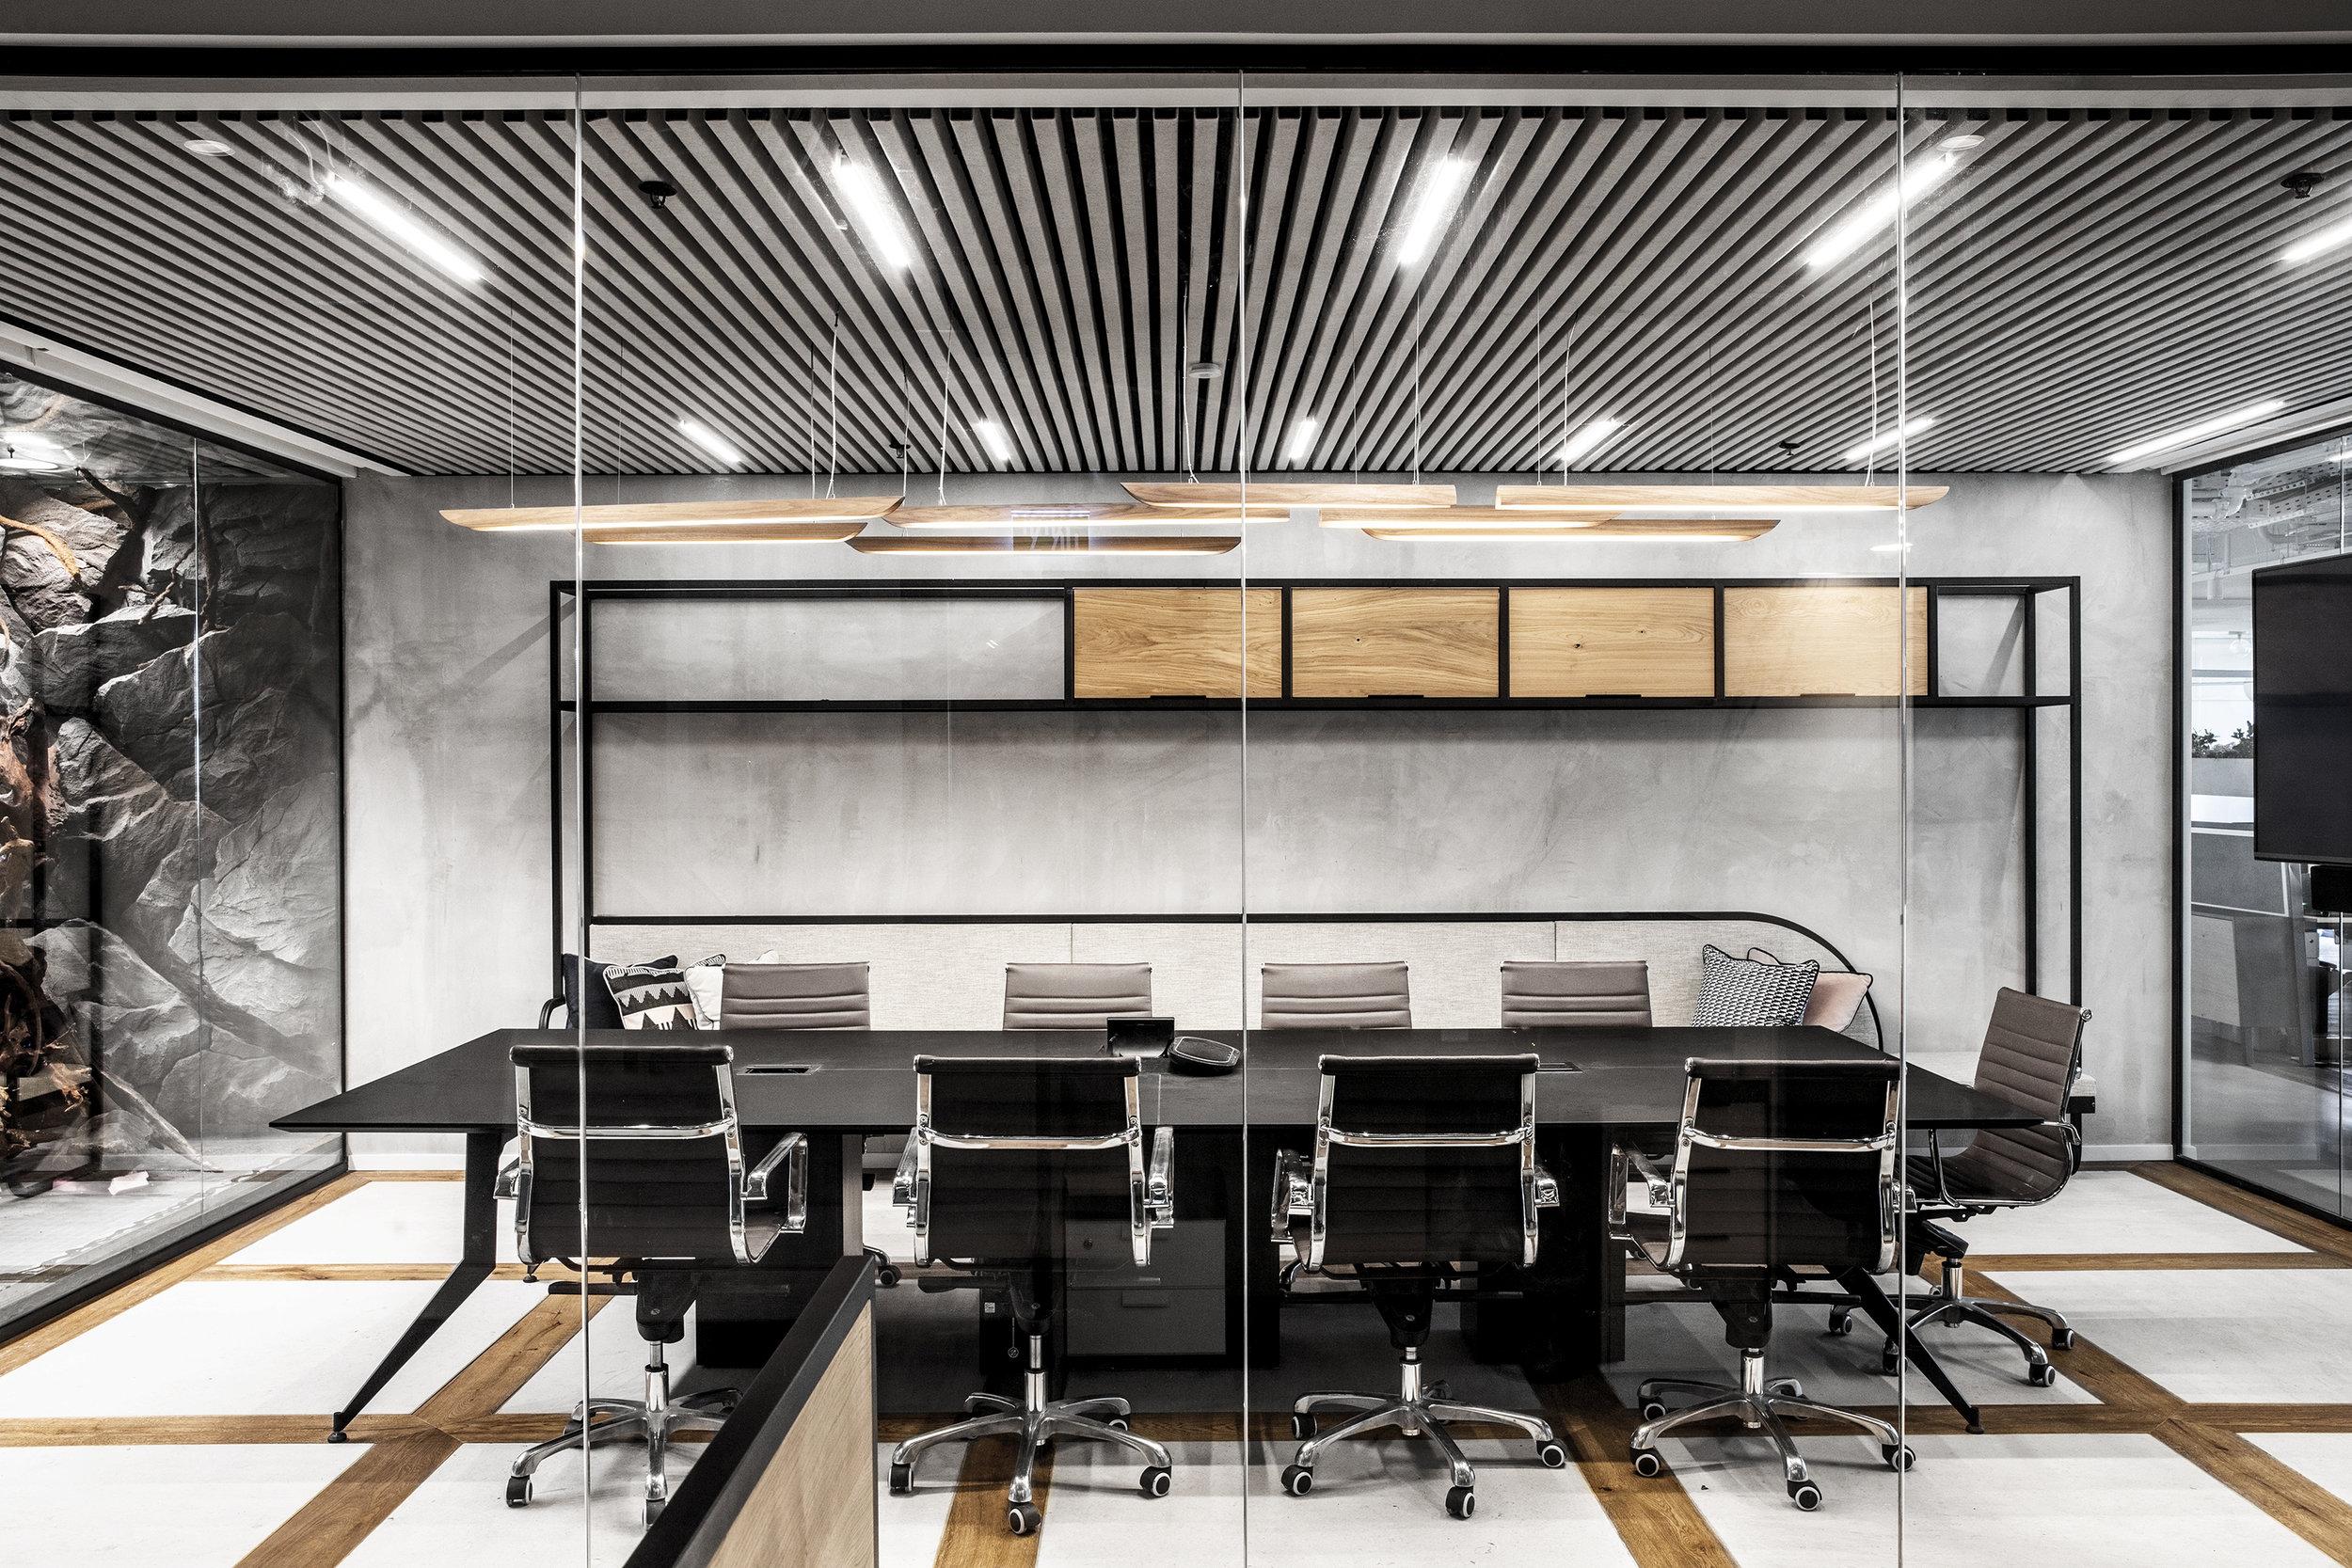 R2NET OFFICES - ROY DAVID ARCHITECTURE  STUDIO - רואי דוד אדריכלות סטודיו אדריכלים - אר2נט (51).jpg